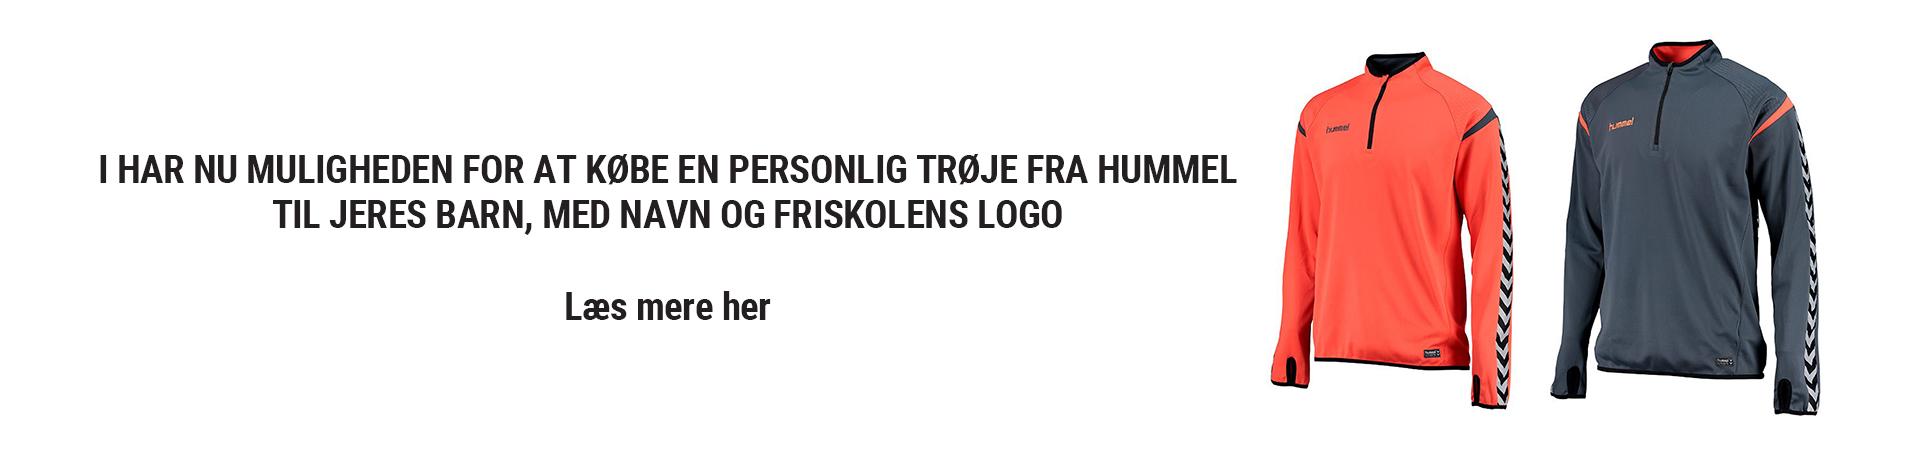 slider-friskolen-paa-roesnaes-hummel-2